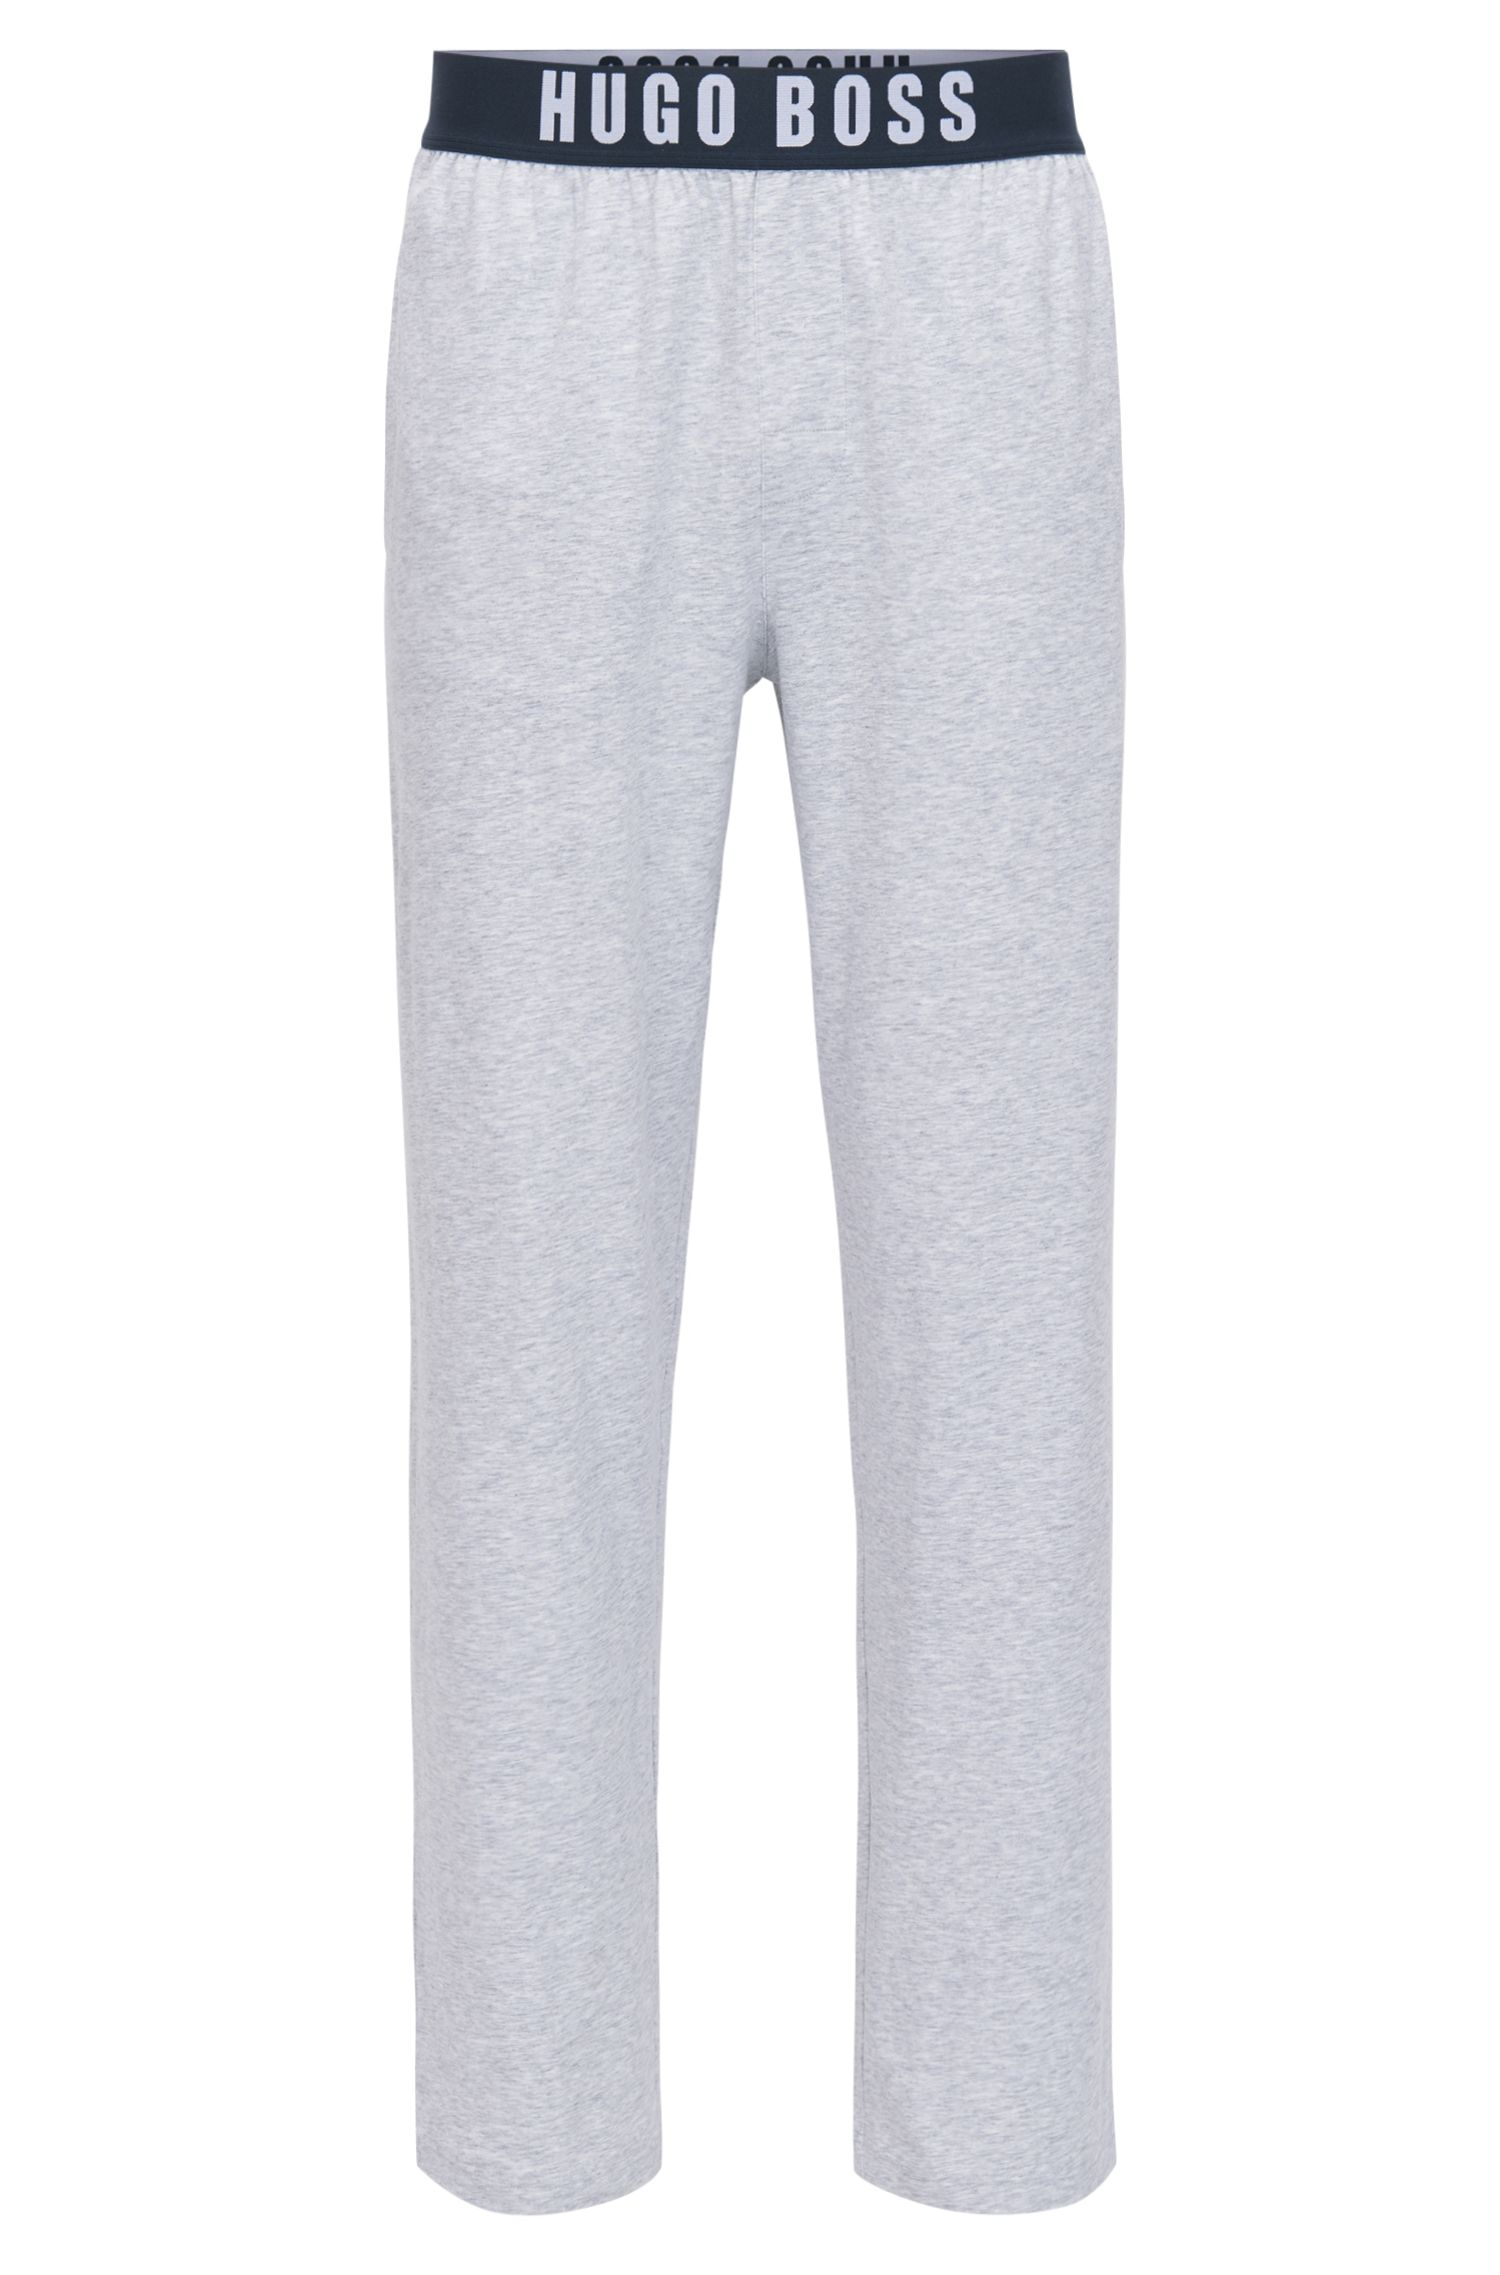 Pyjama trousers in stretch cotton jersey